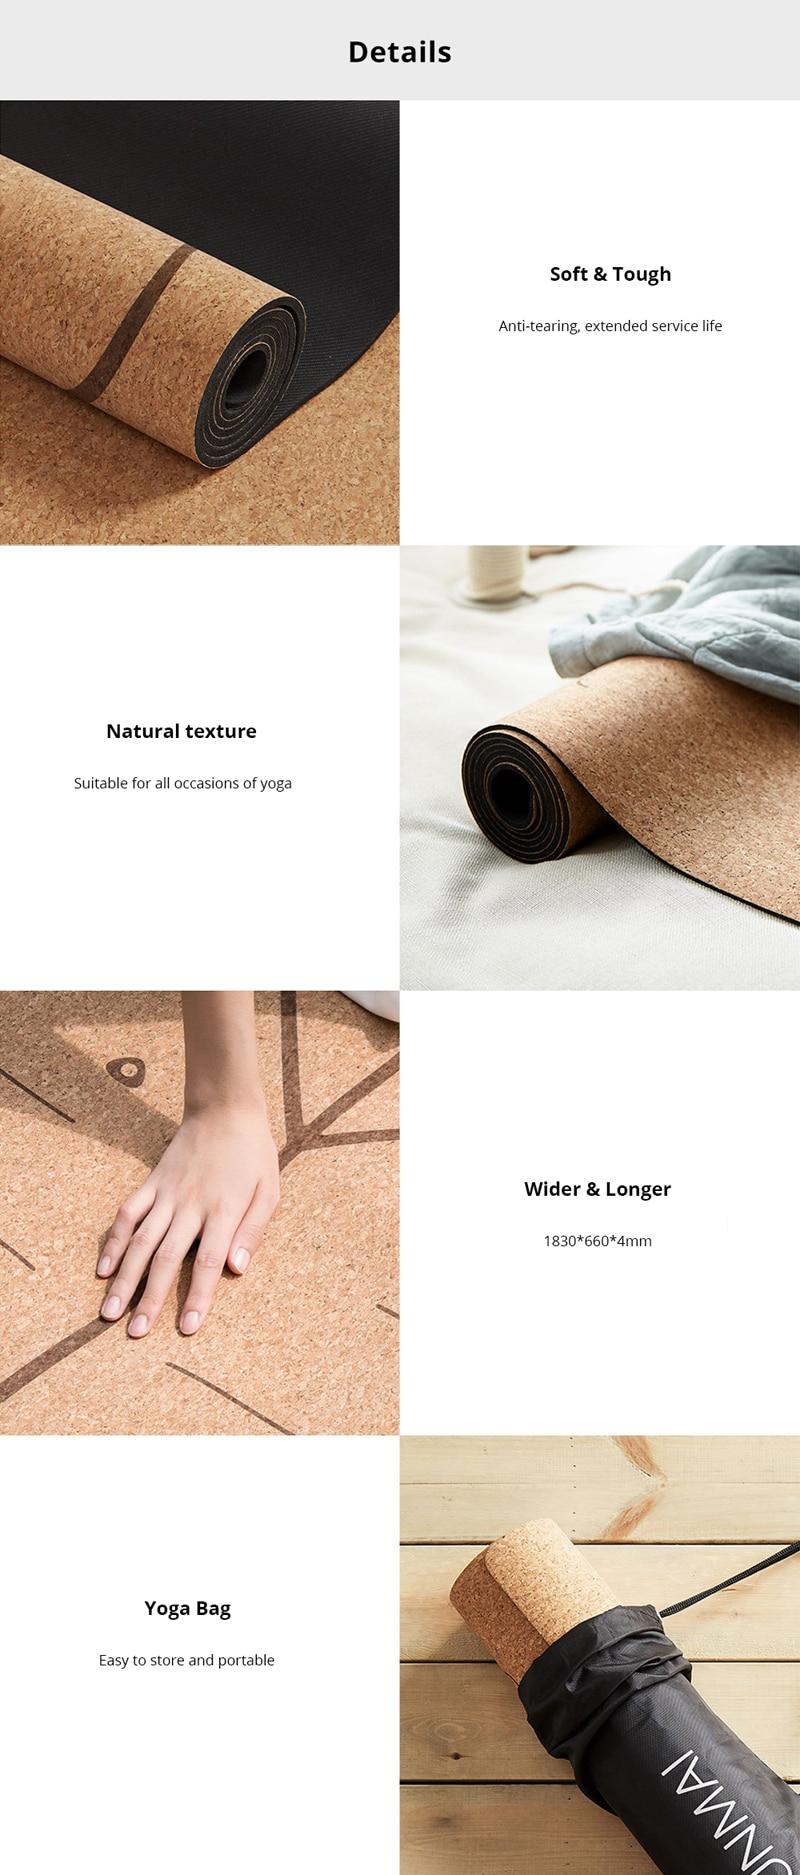 XIAOMI YUNMAI 4mm Natural Rubber Soft Cork Yoga Mat 4